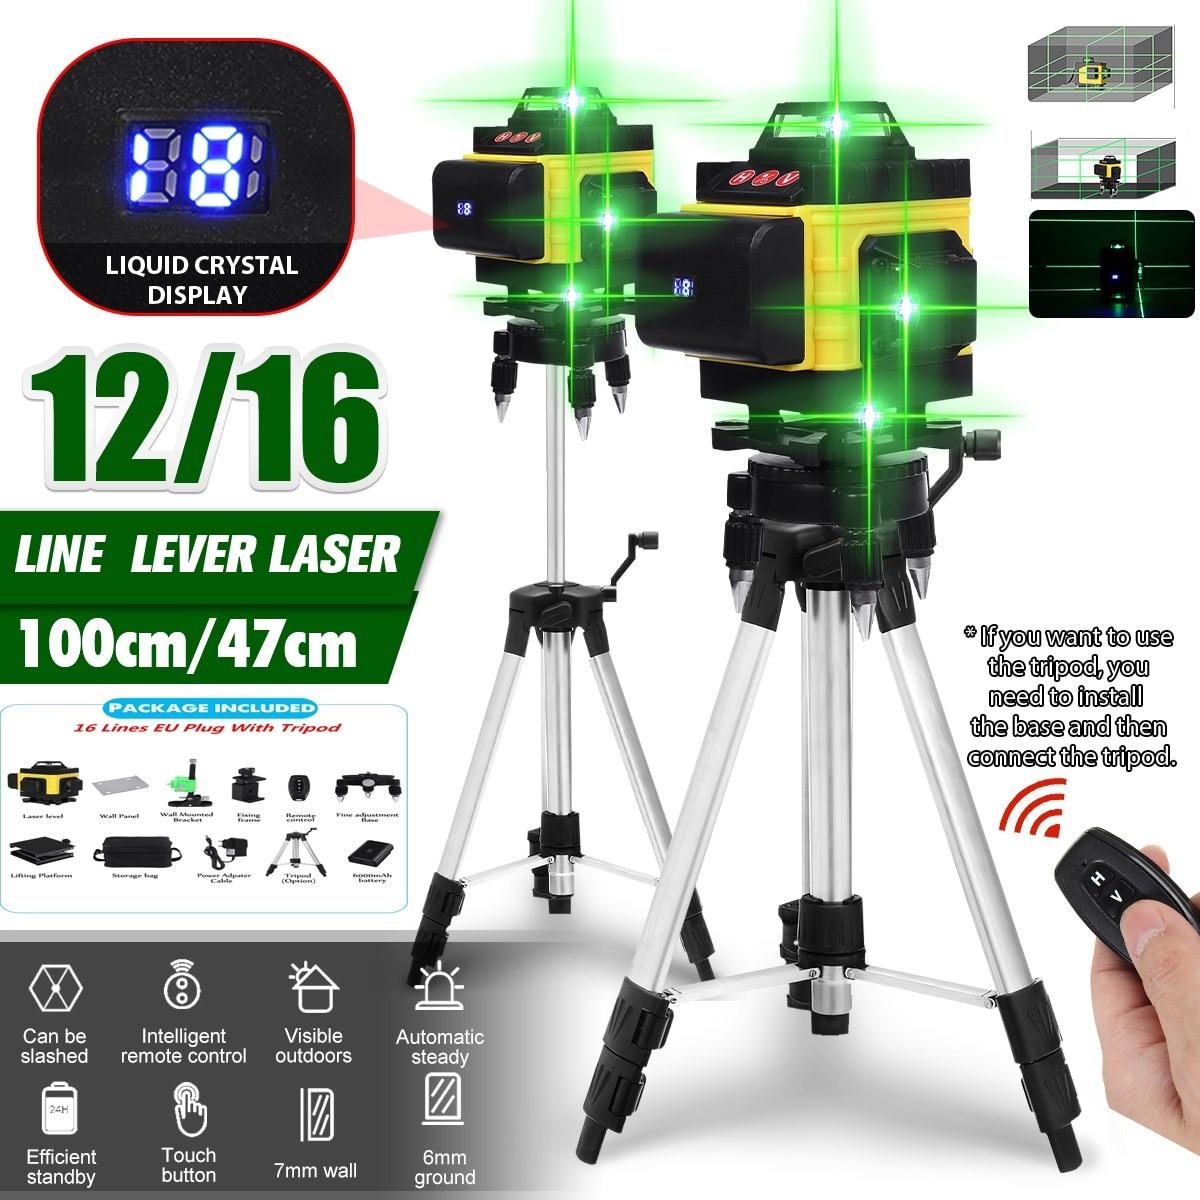 verde auto-nivelamento 360 horizontal & vertical poderoso